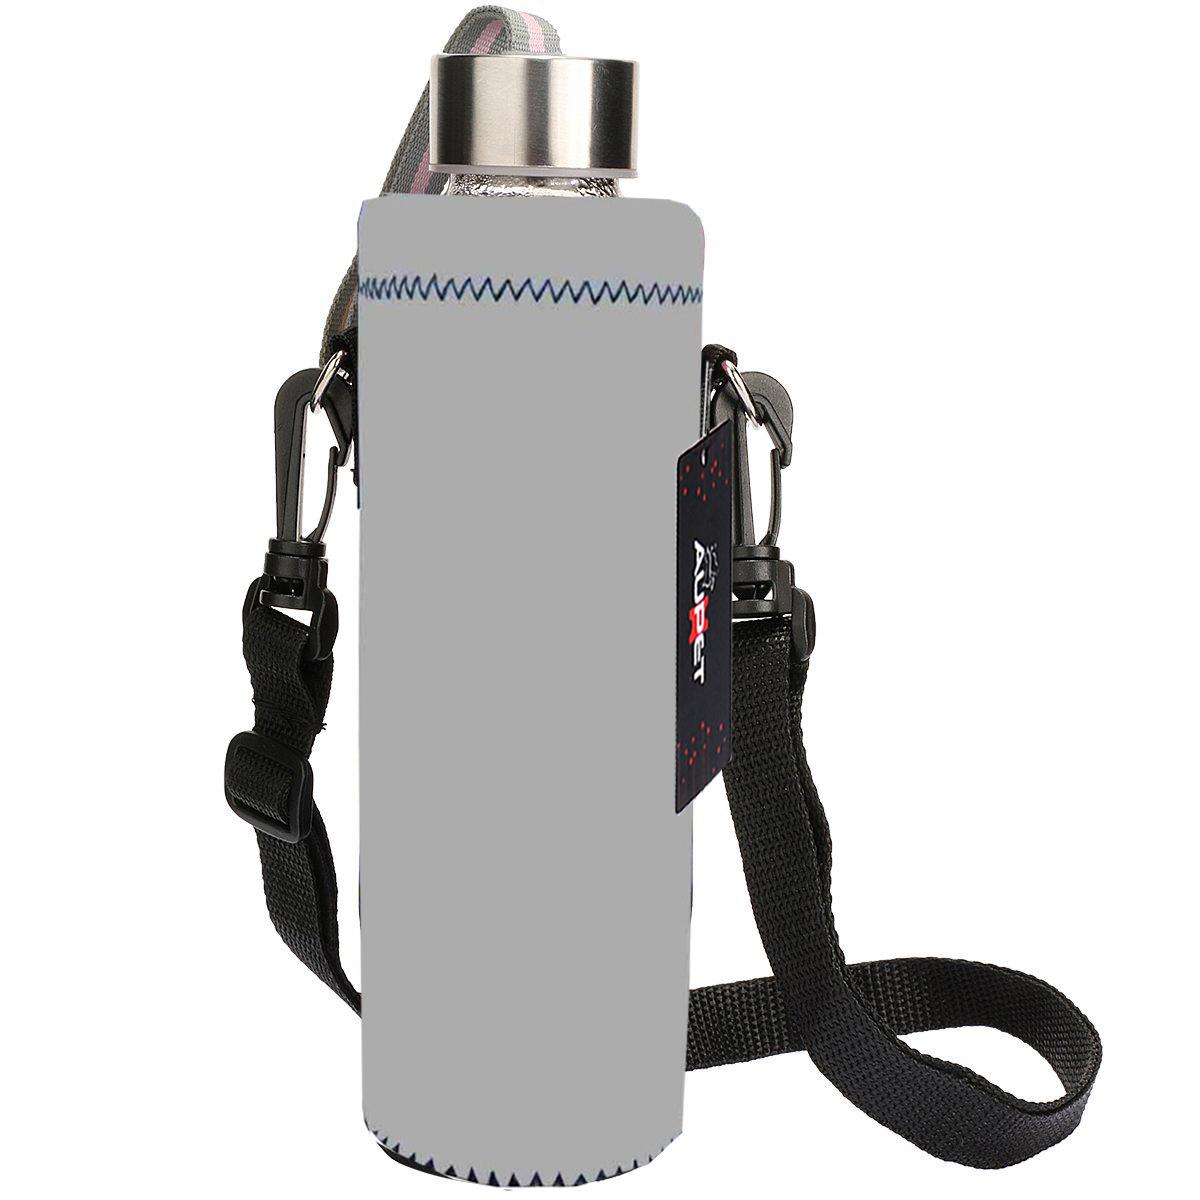 Aupet Water Bottle Carrier Insulated Neoprene Water Bottle